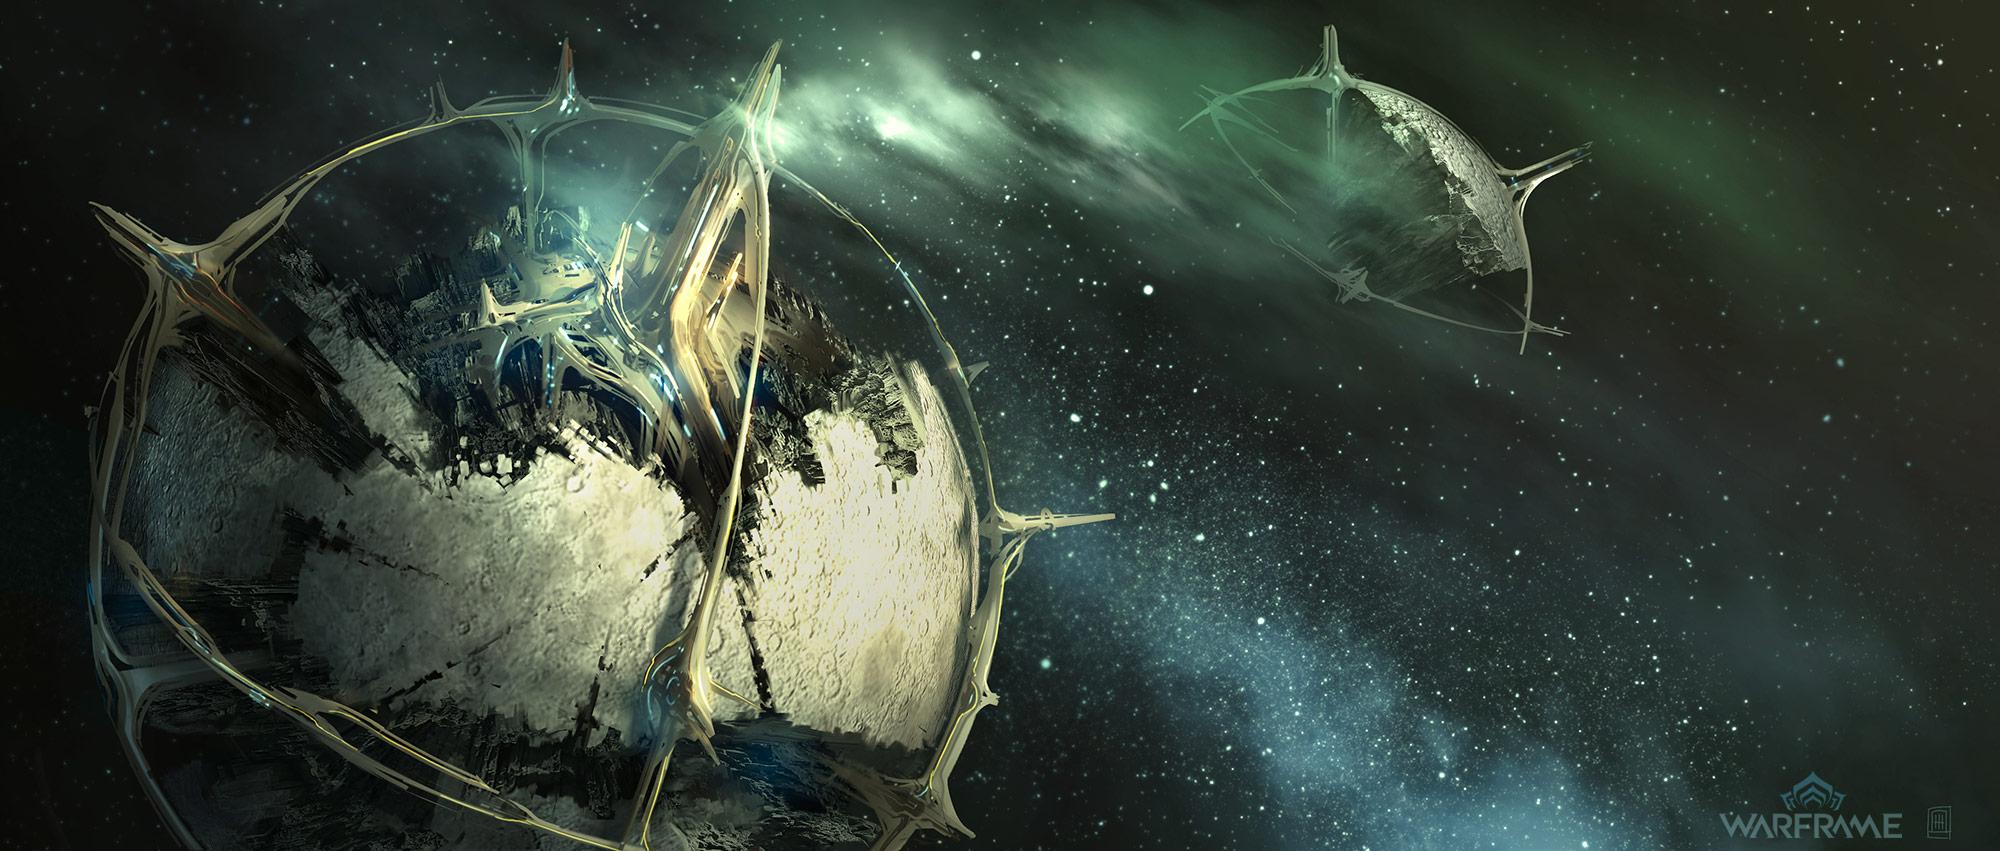 Warframe_Orokin_Moon_01